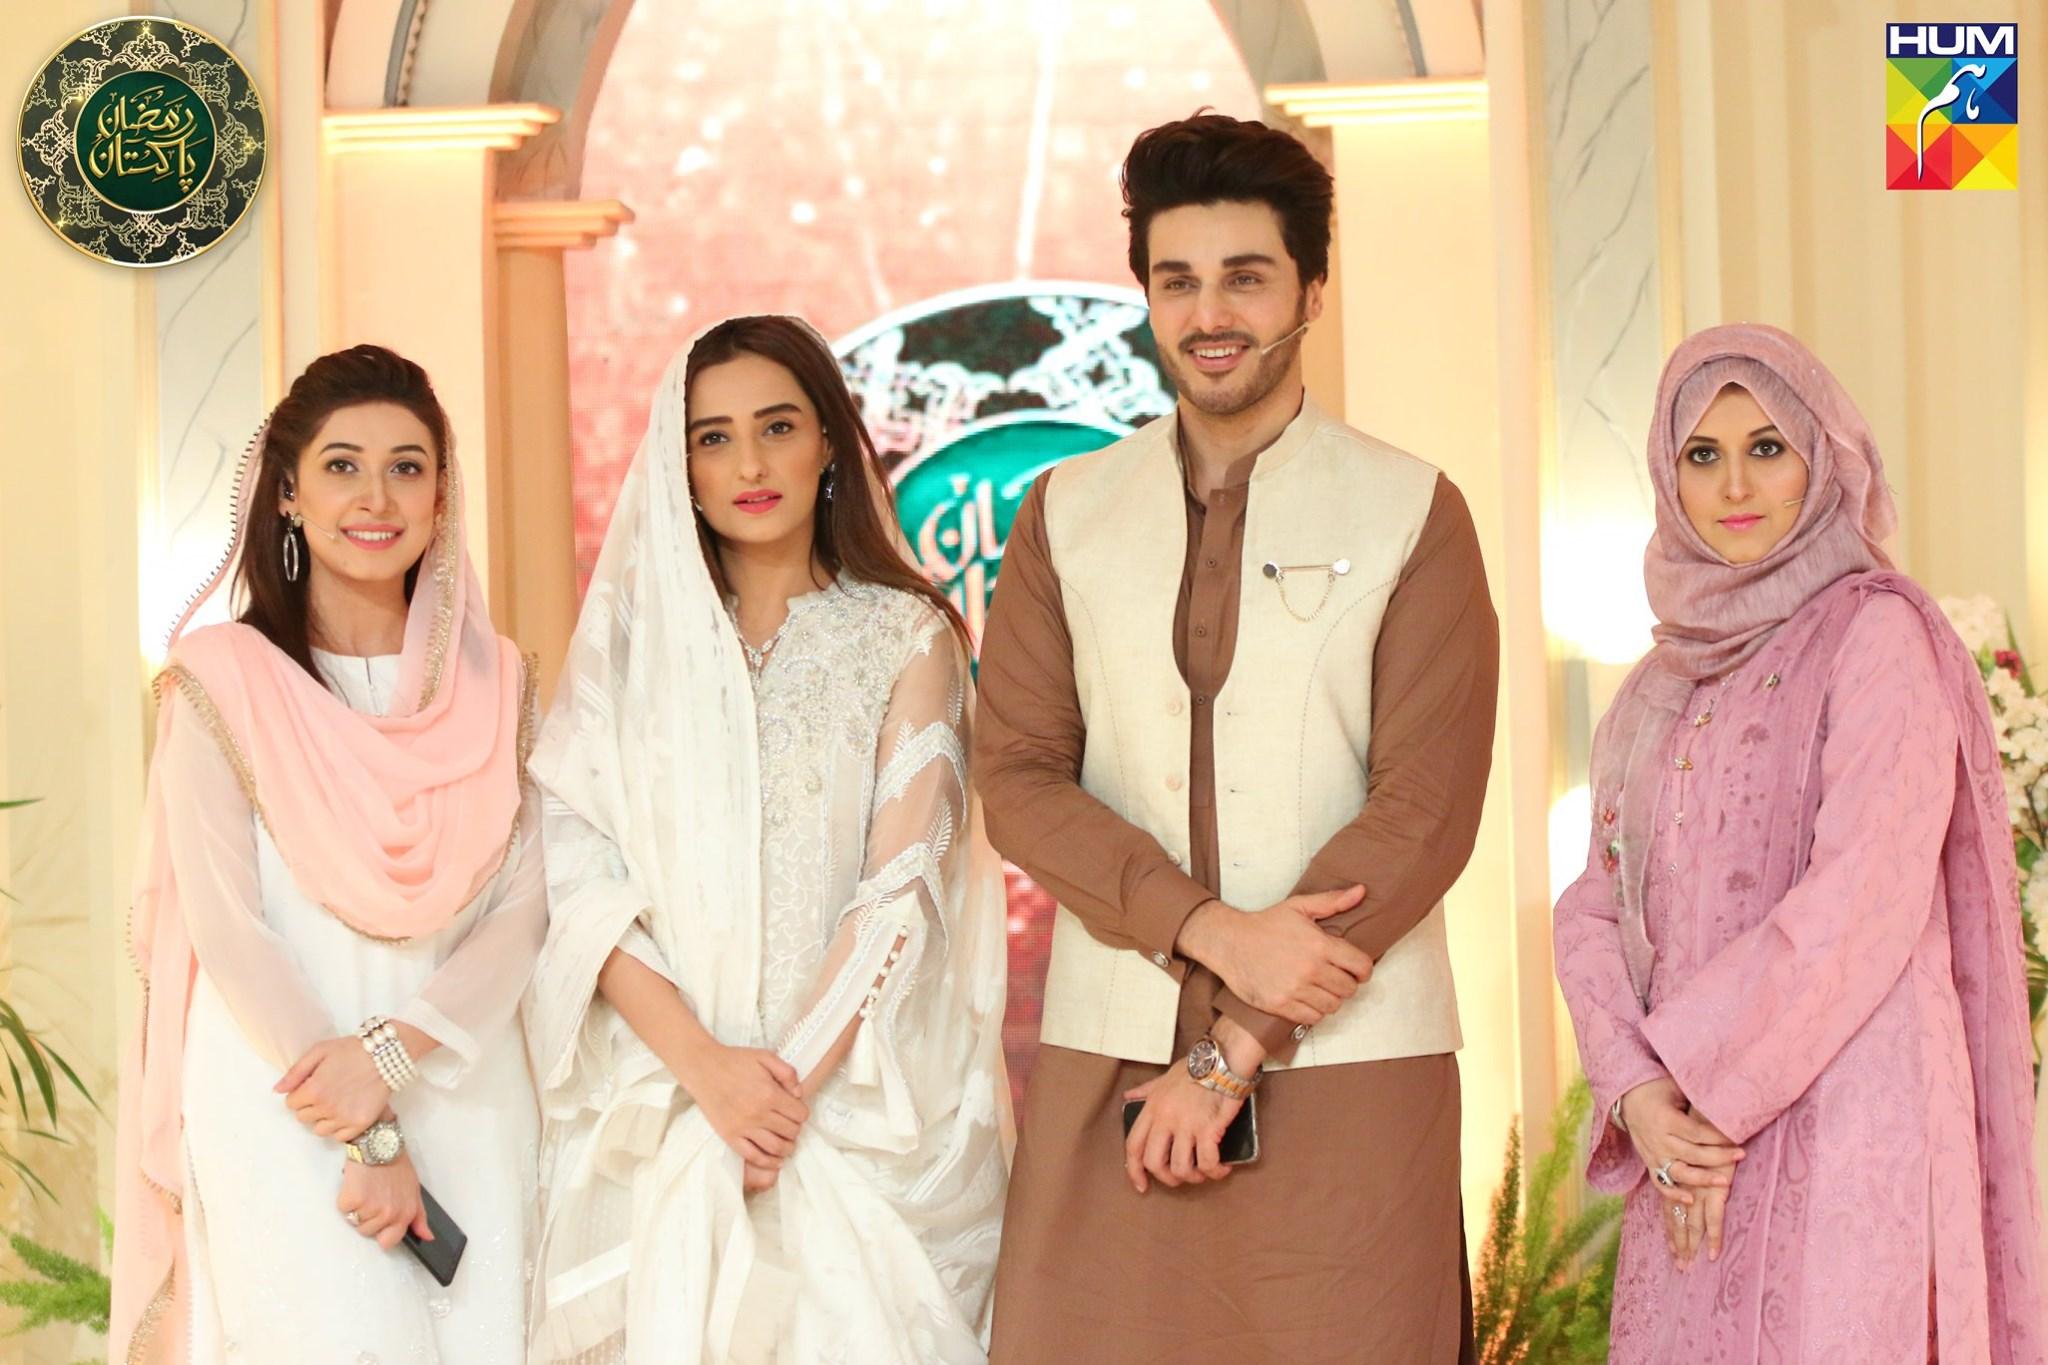 Moomal Sheikh Guest in Ramzan Pakistan Transmission on Humtv (1)